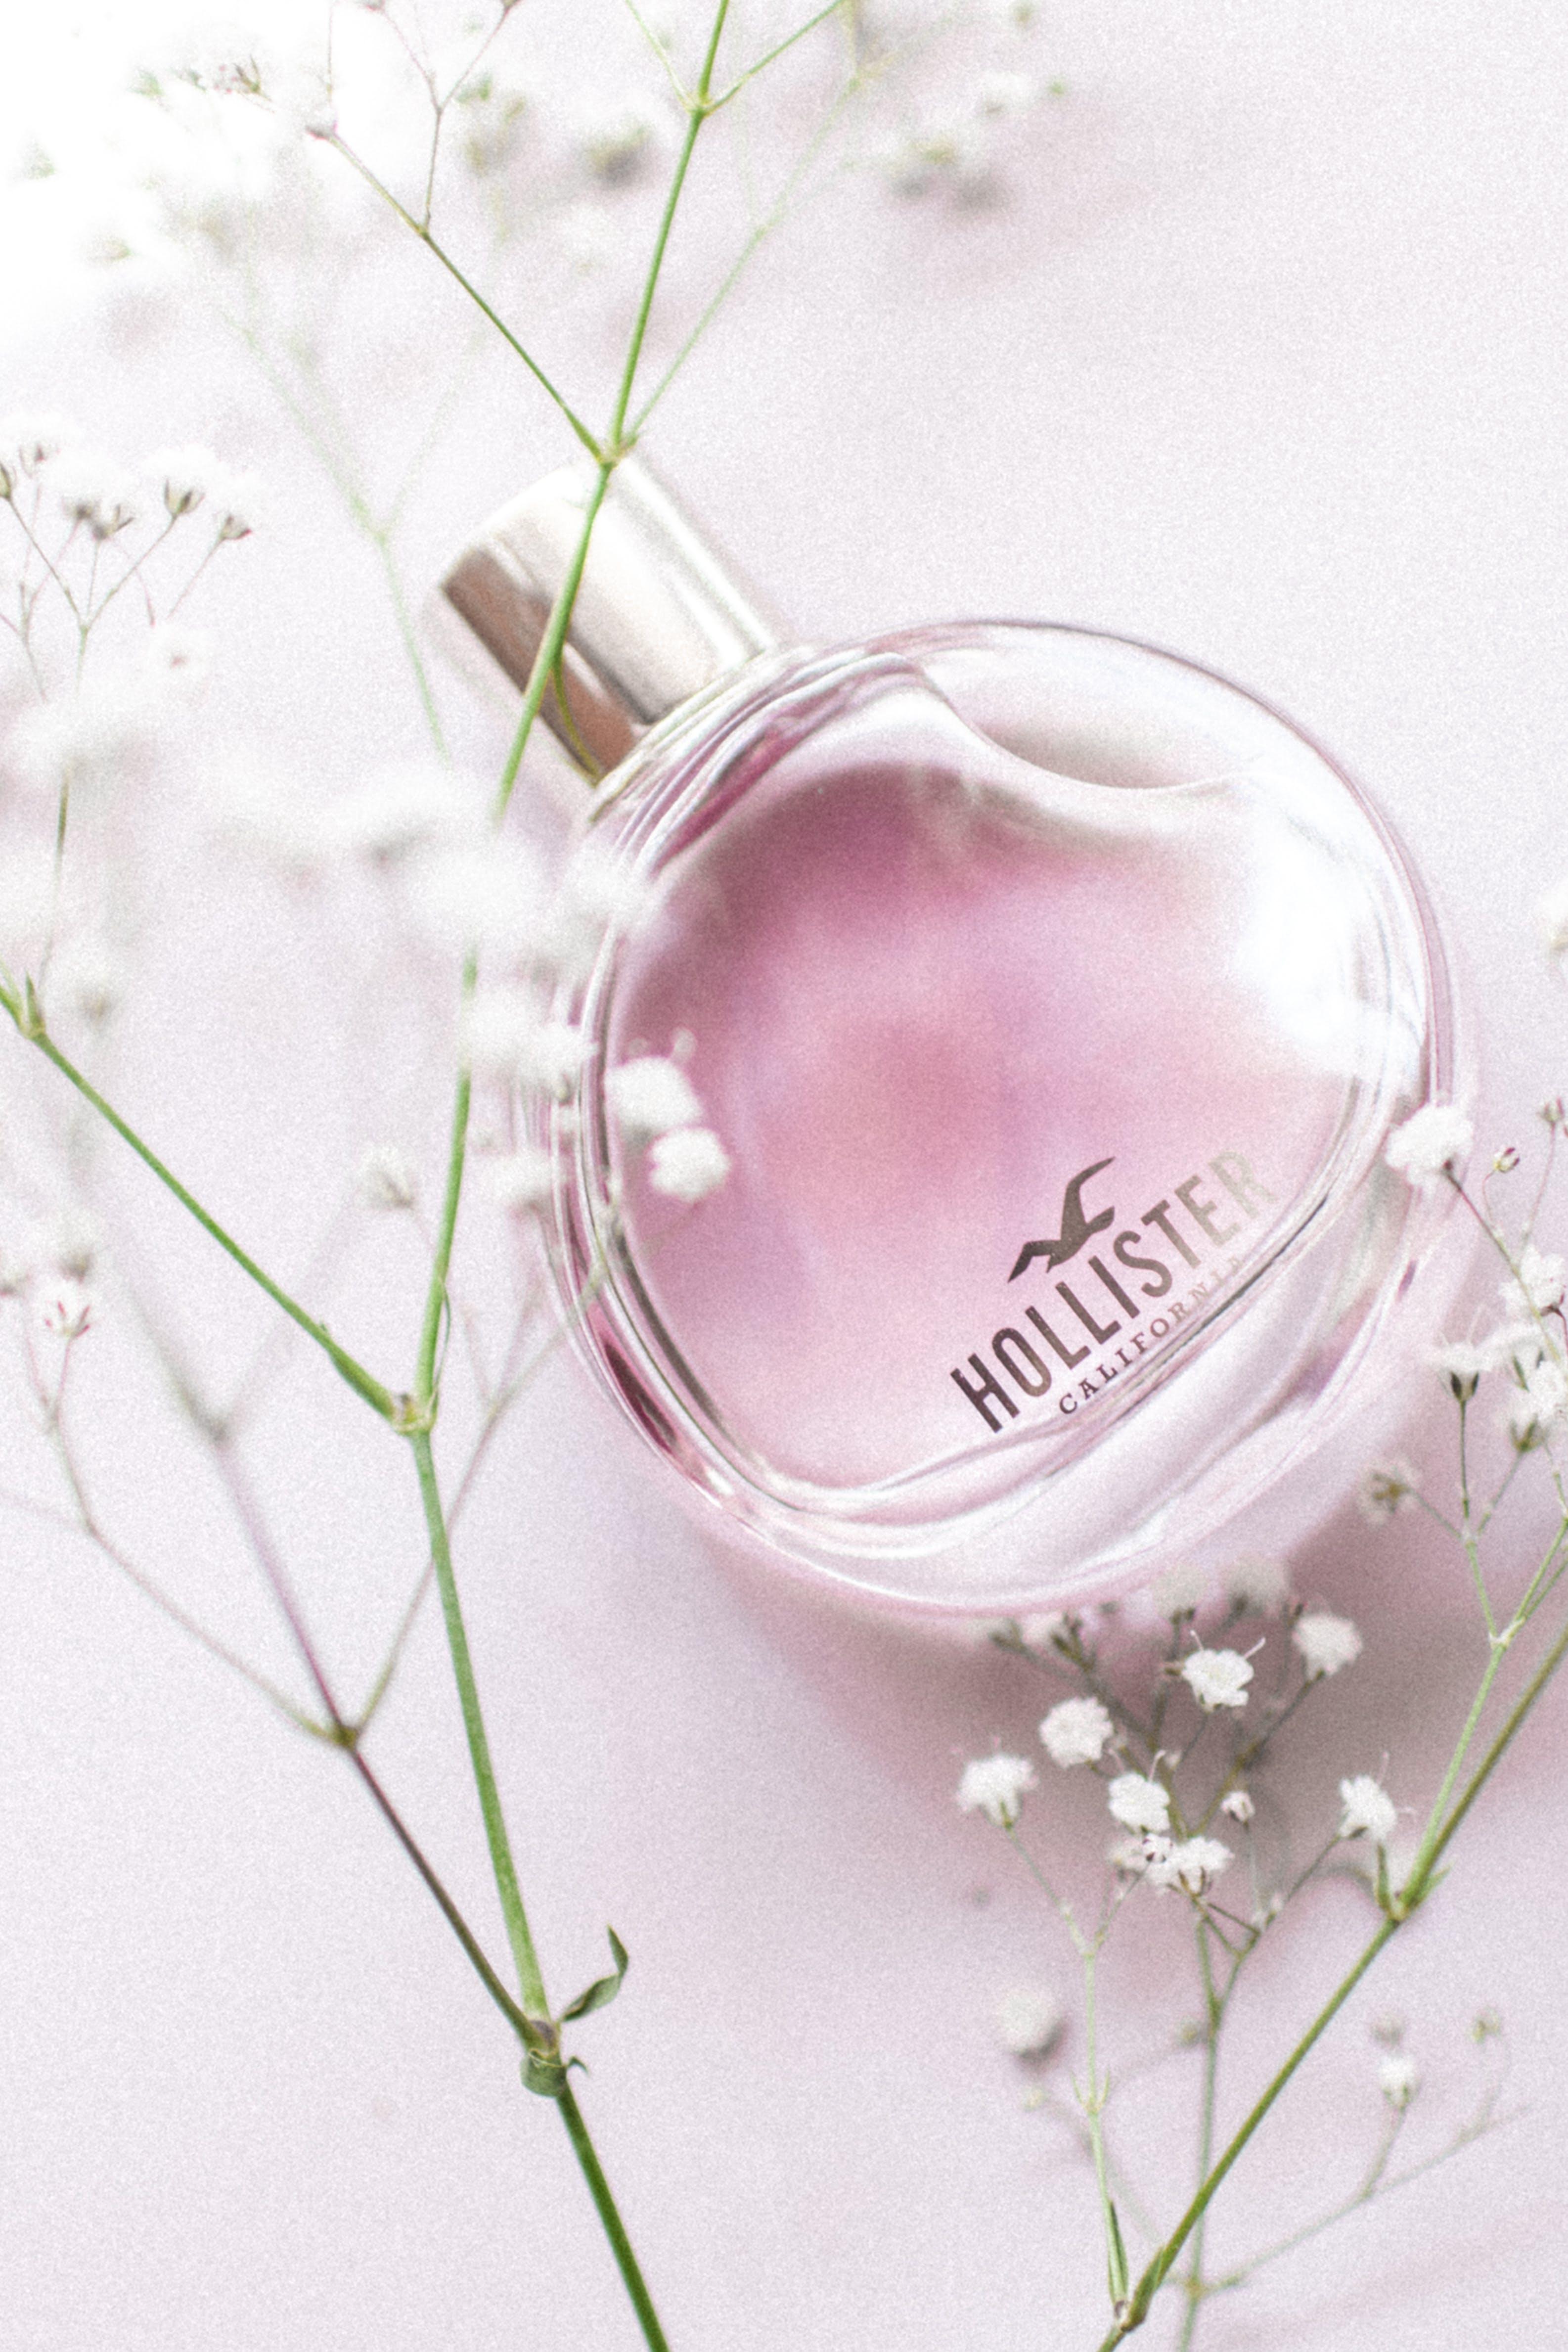 Close-Up Photo of Hollister Fragrance Bottle